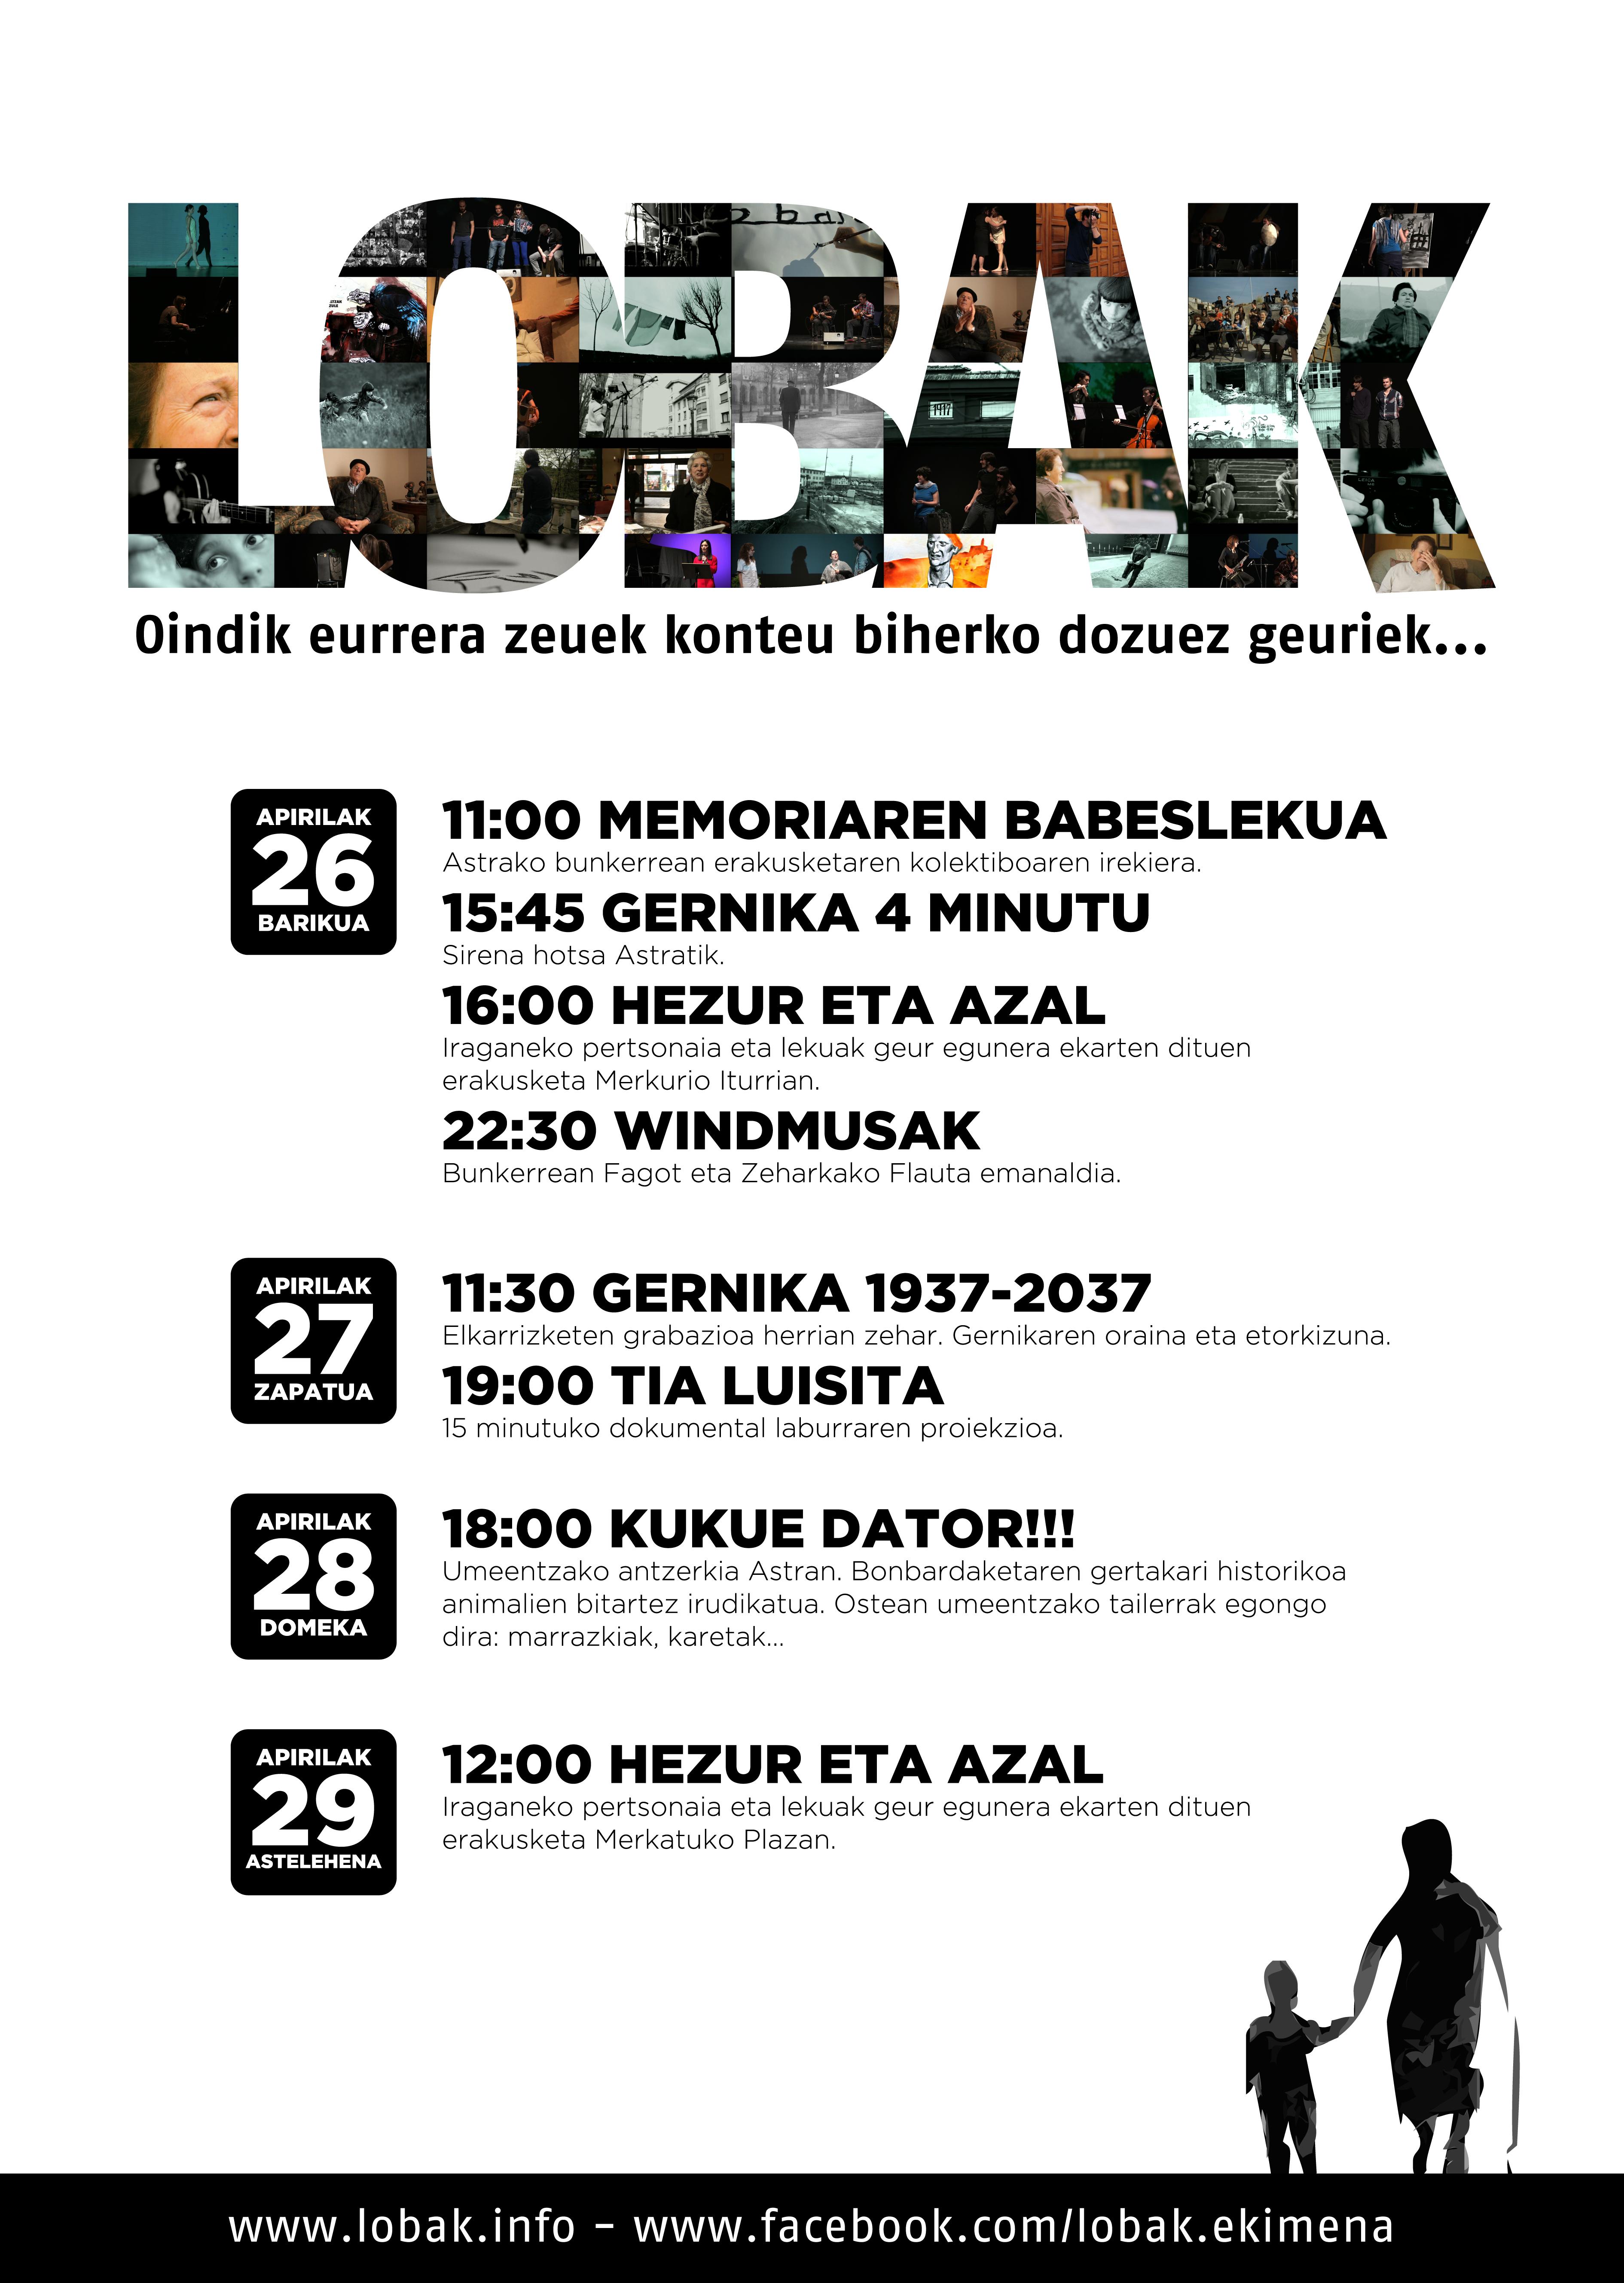 LOBAK_KARTELA